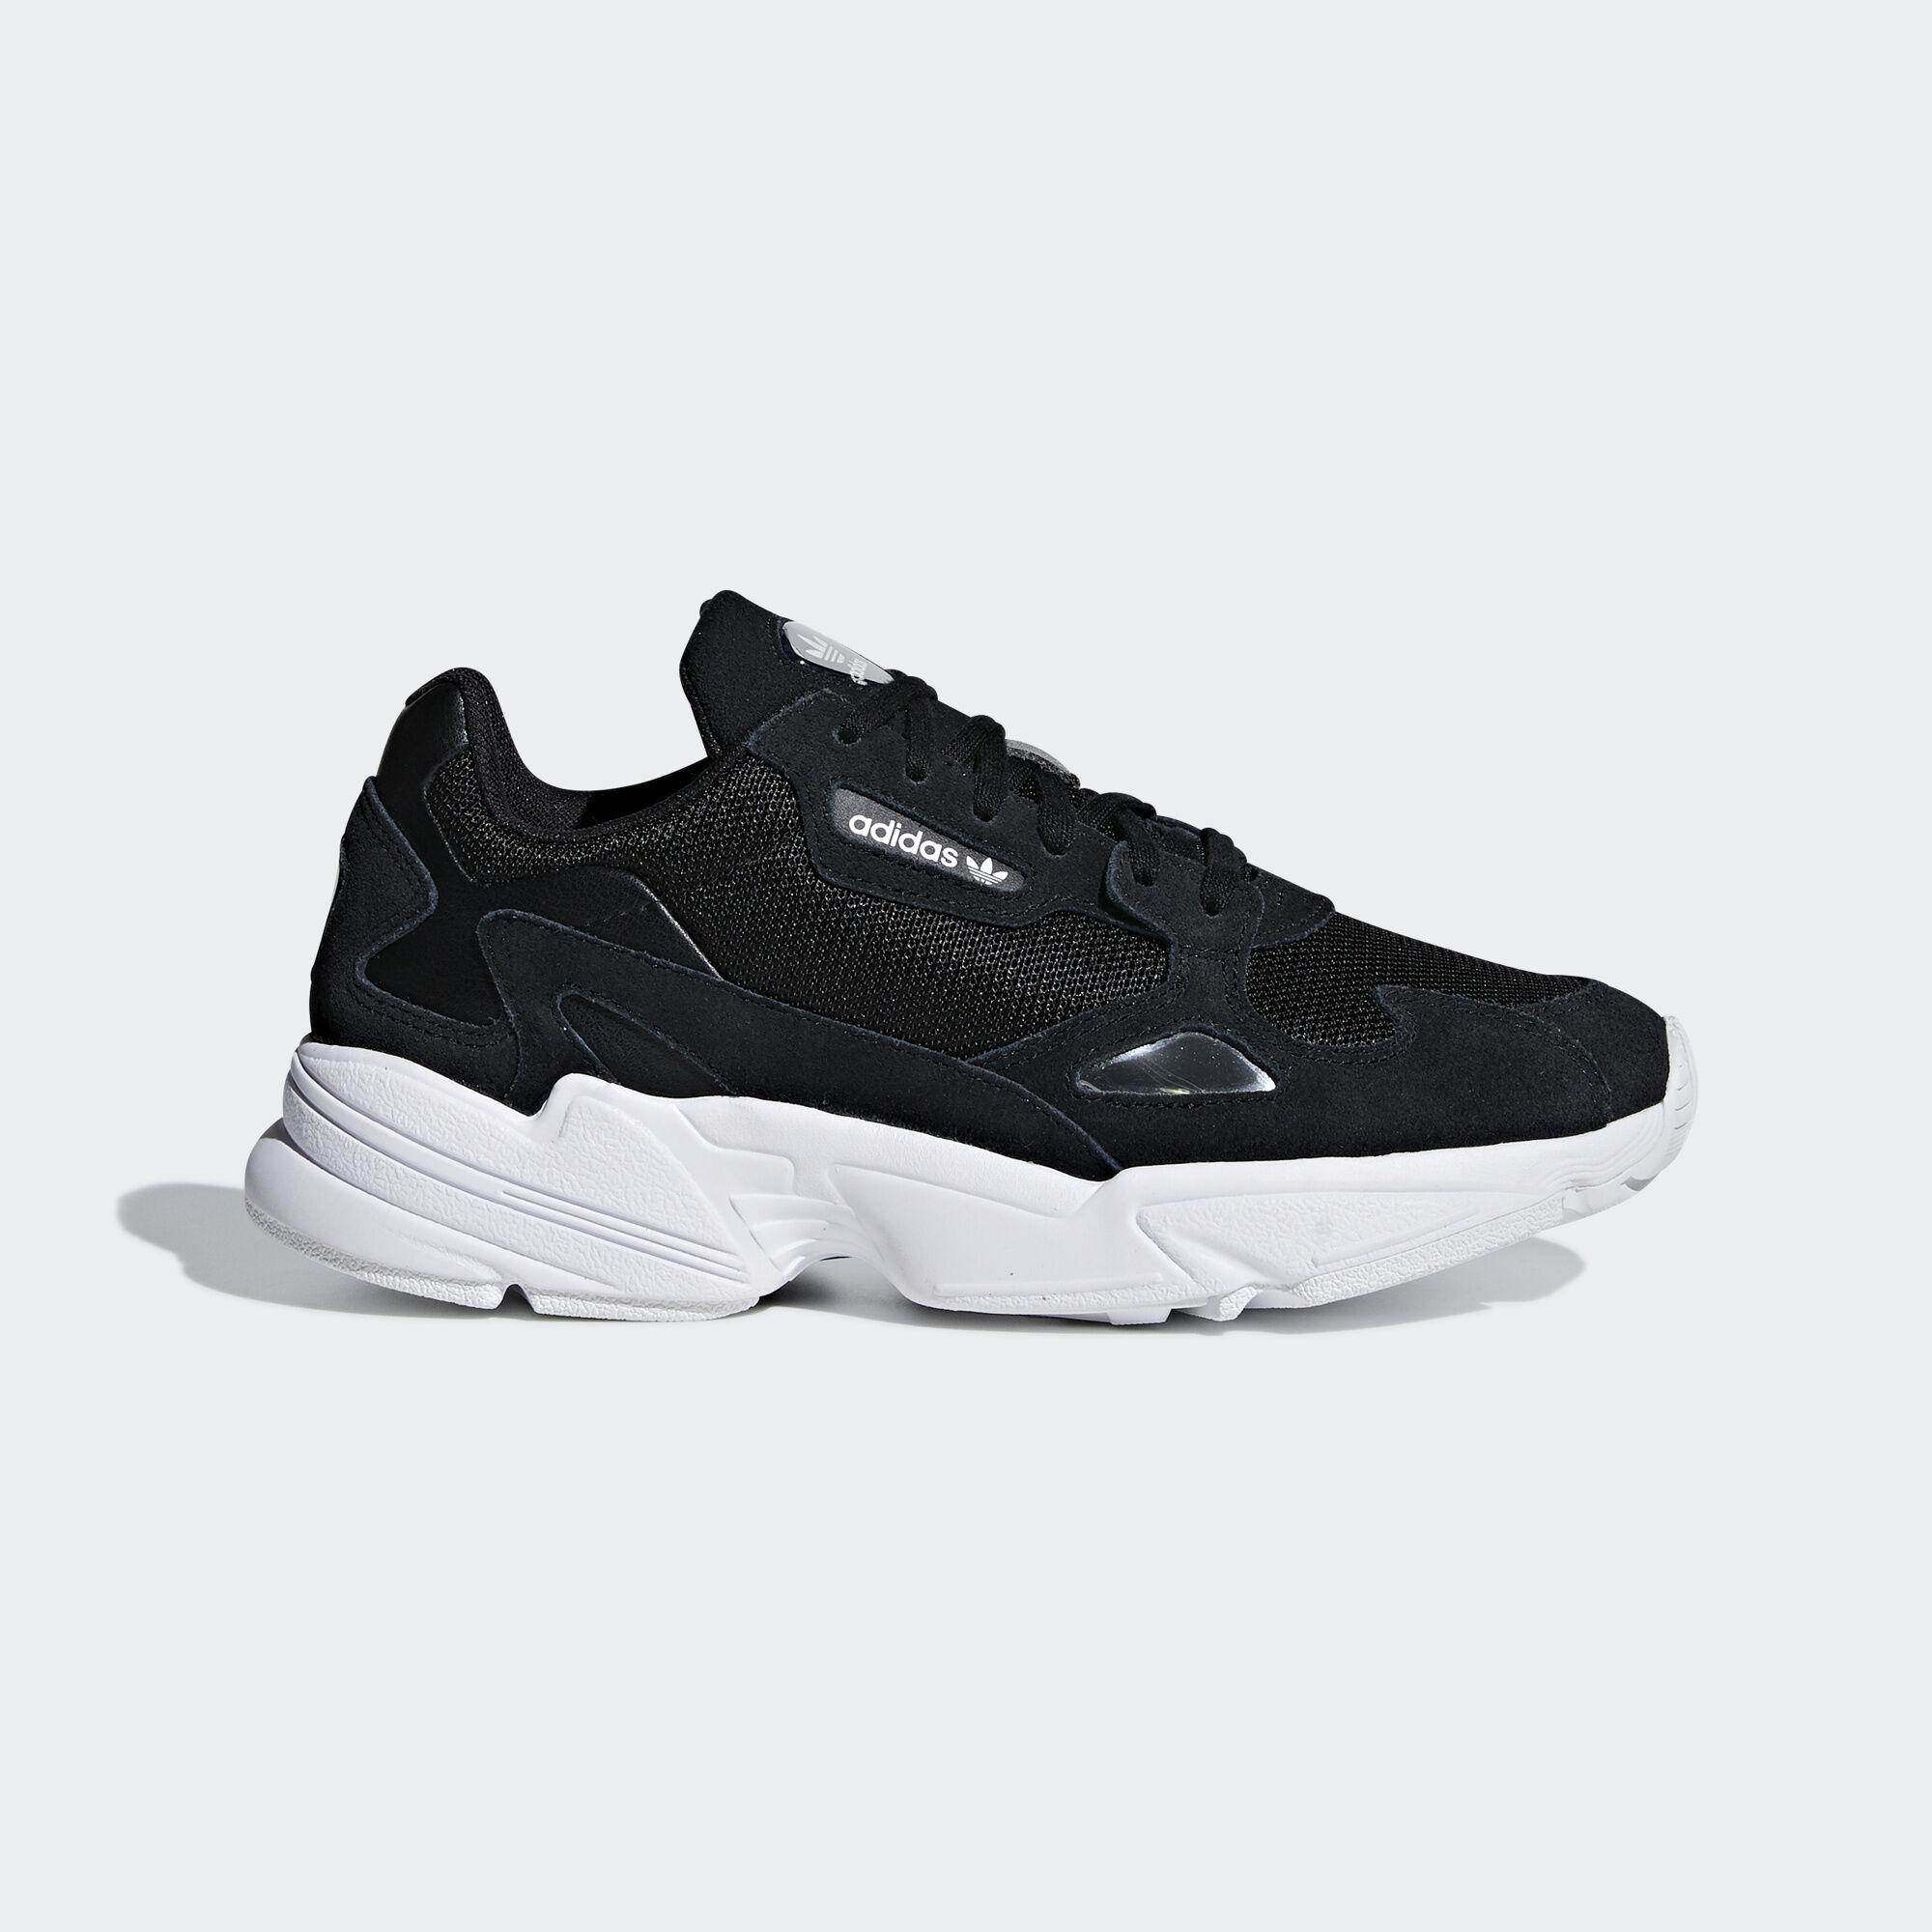 sale retailer 73bc5 caa64 adidas - Falcon Shoes Core Black  Core Black  Ftwr White B28129. Women  Originals